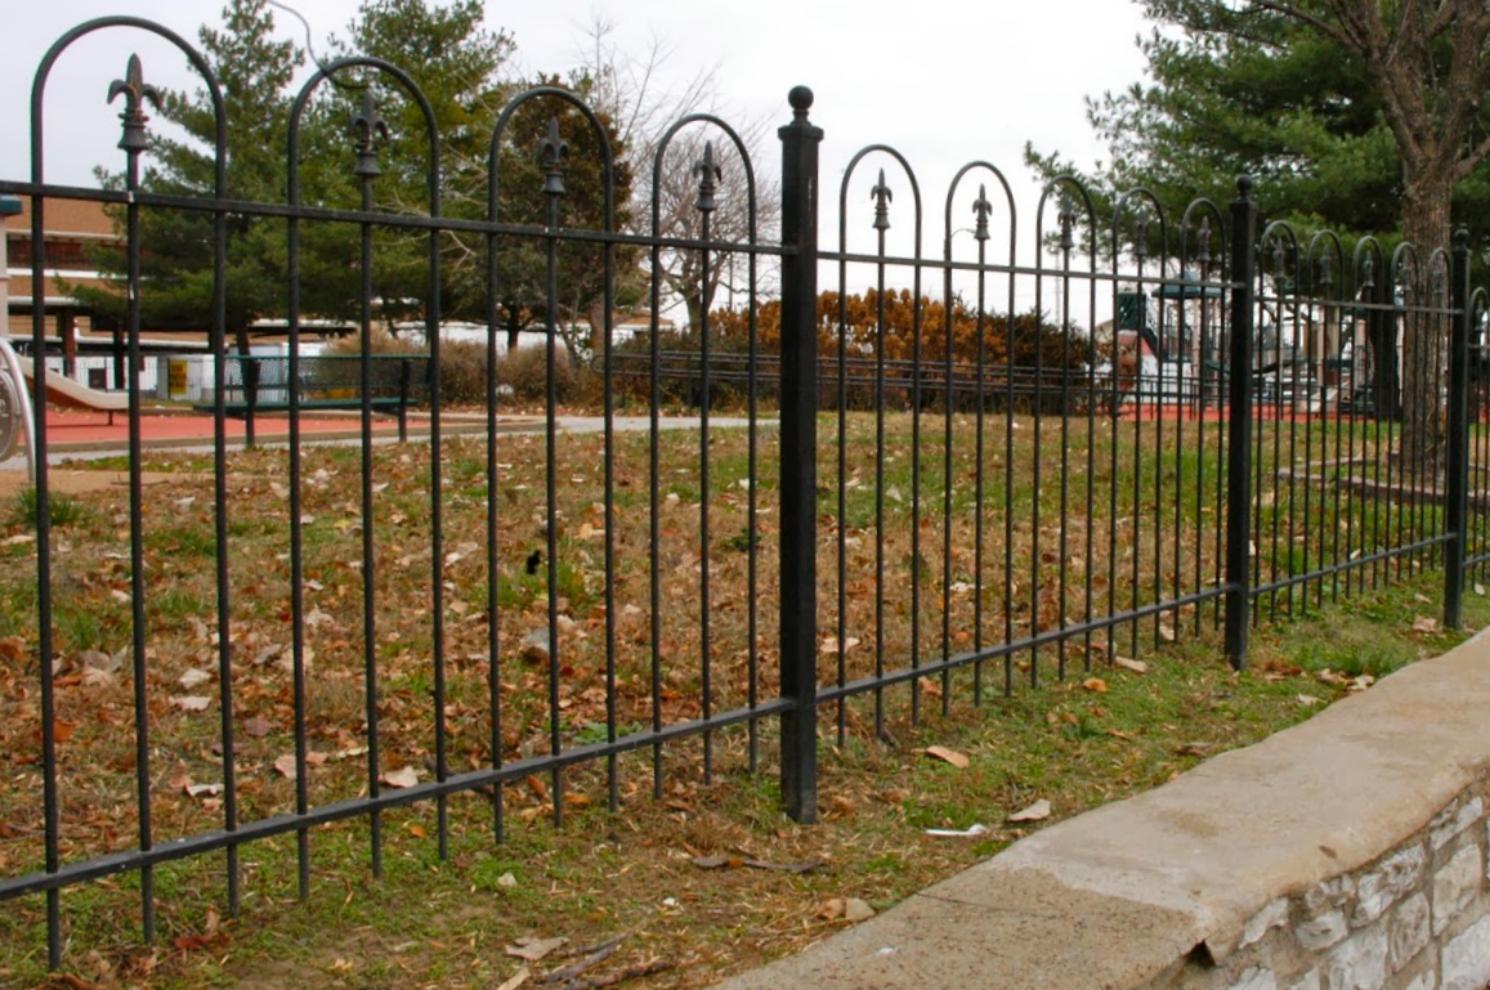 Soulard Market Park & Pontiac Square ParkOrnamental Iron Fencing